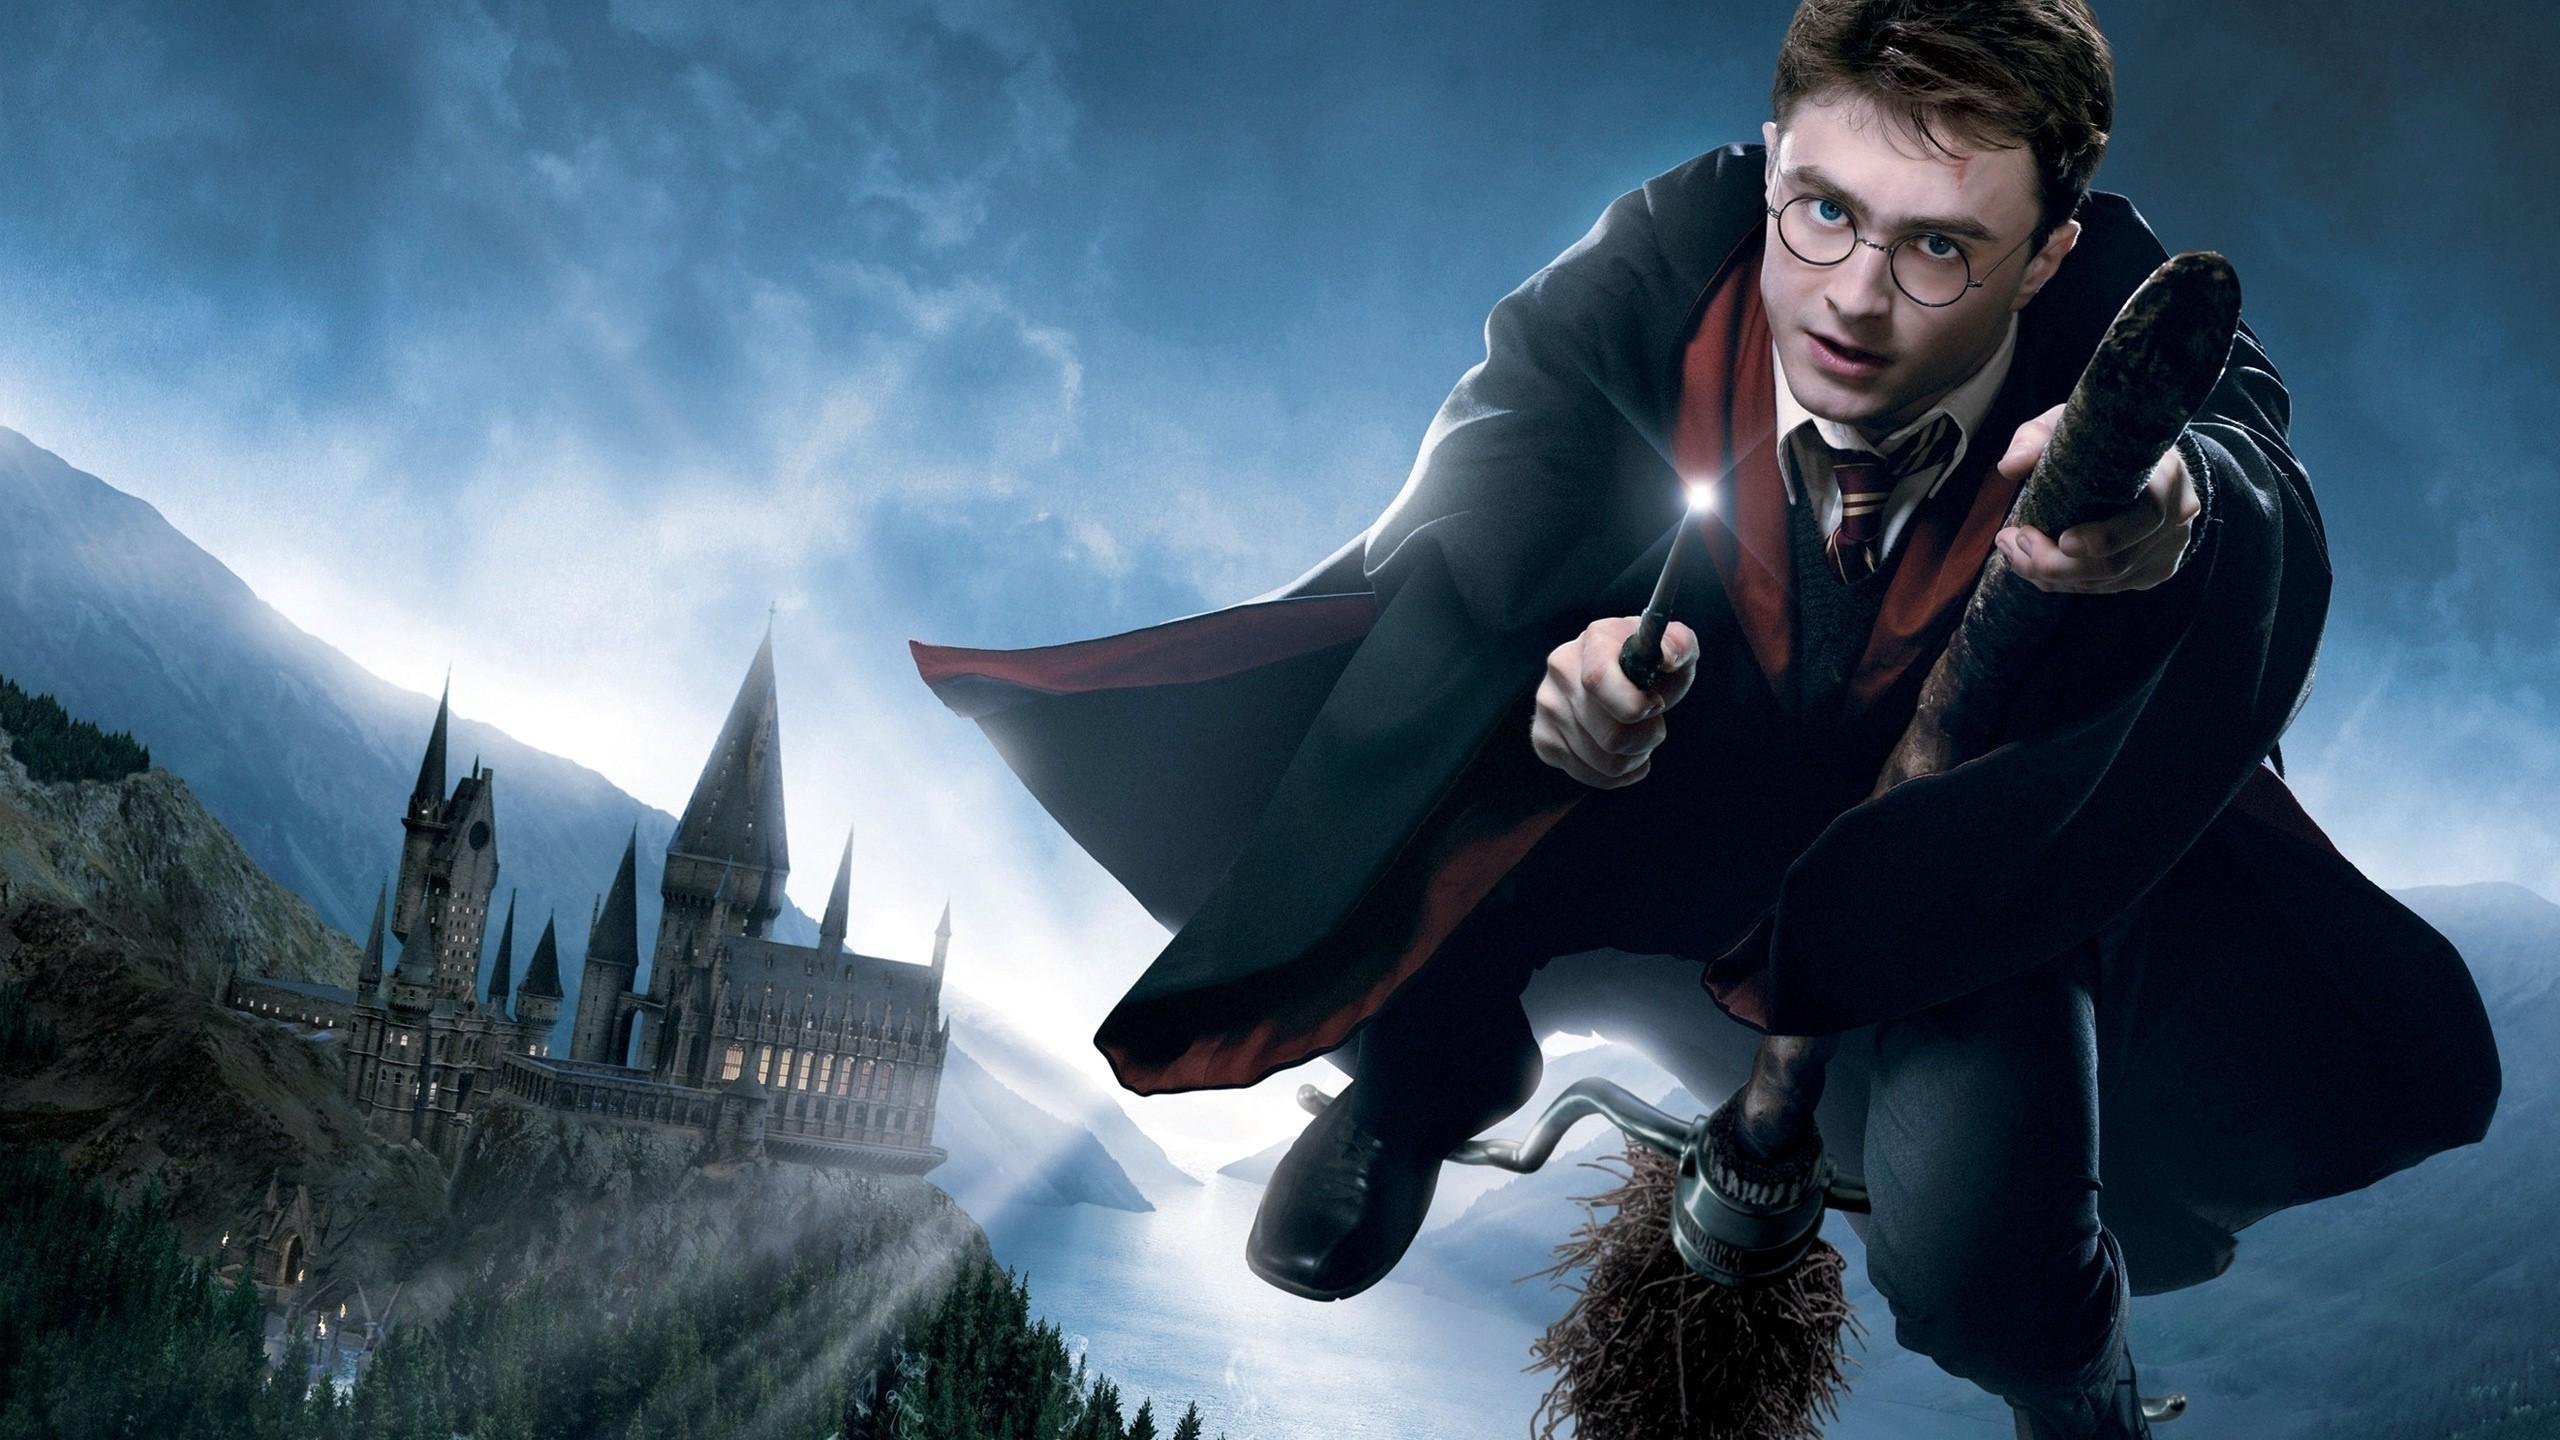 Harry Potter Wallpapers Hd: Harry Potter Hogwarts Wallpaper (65+ Images